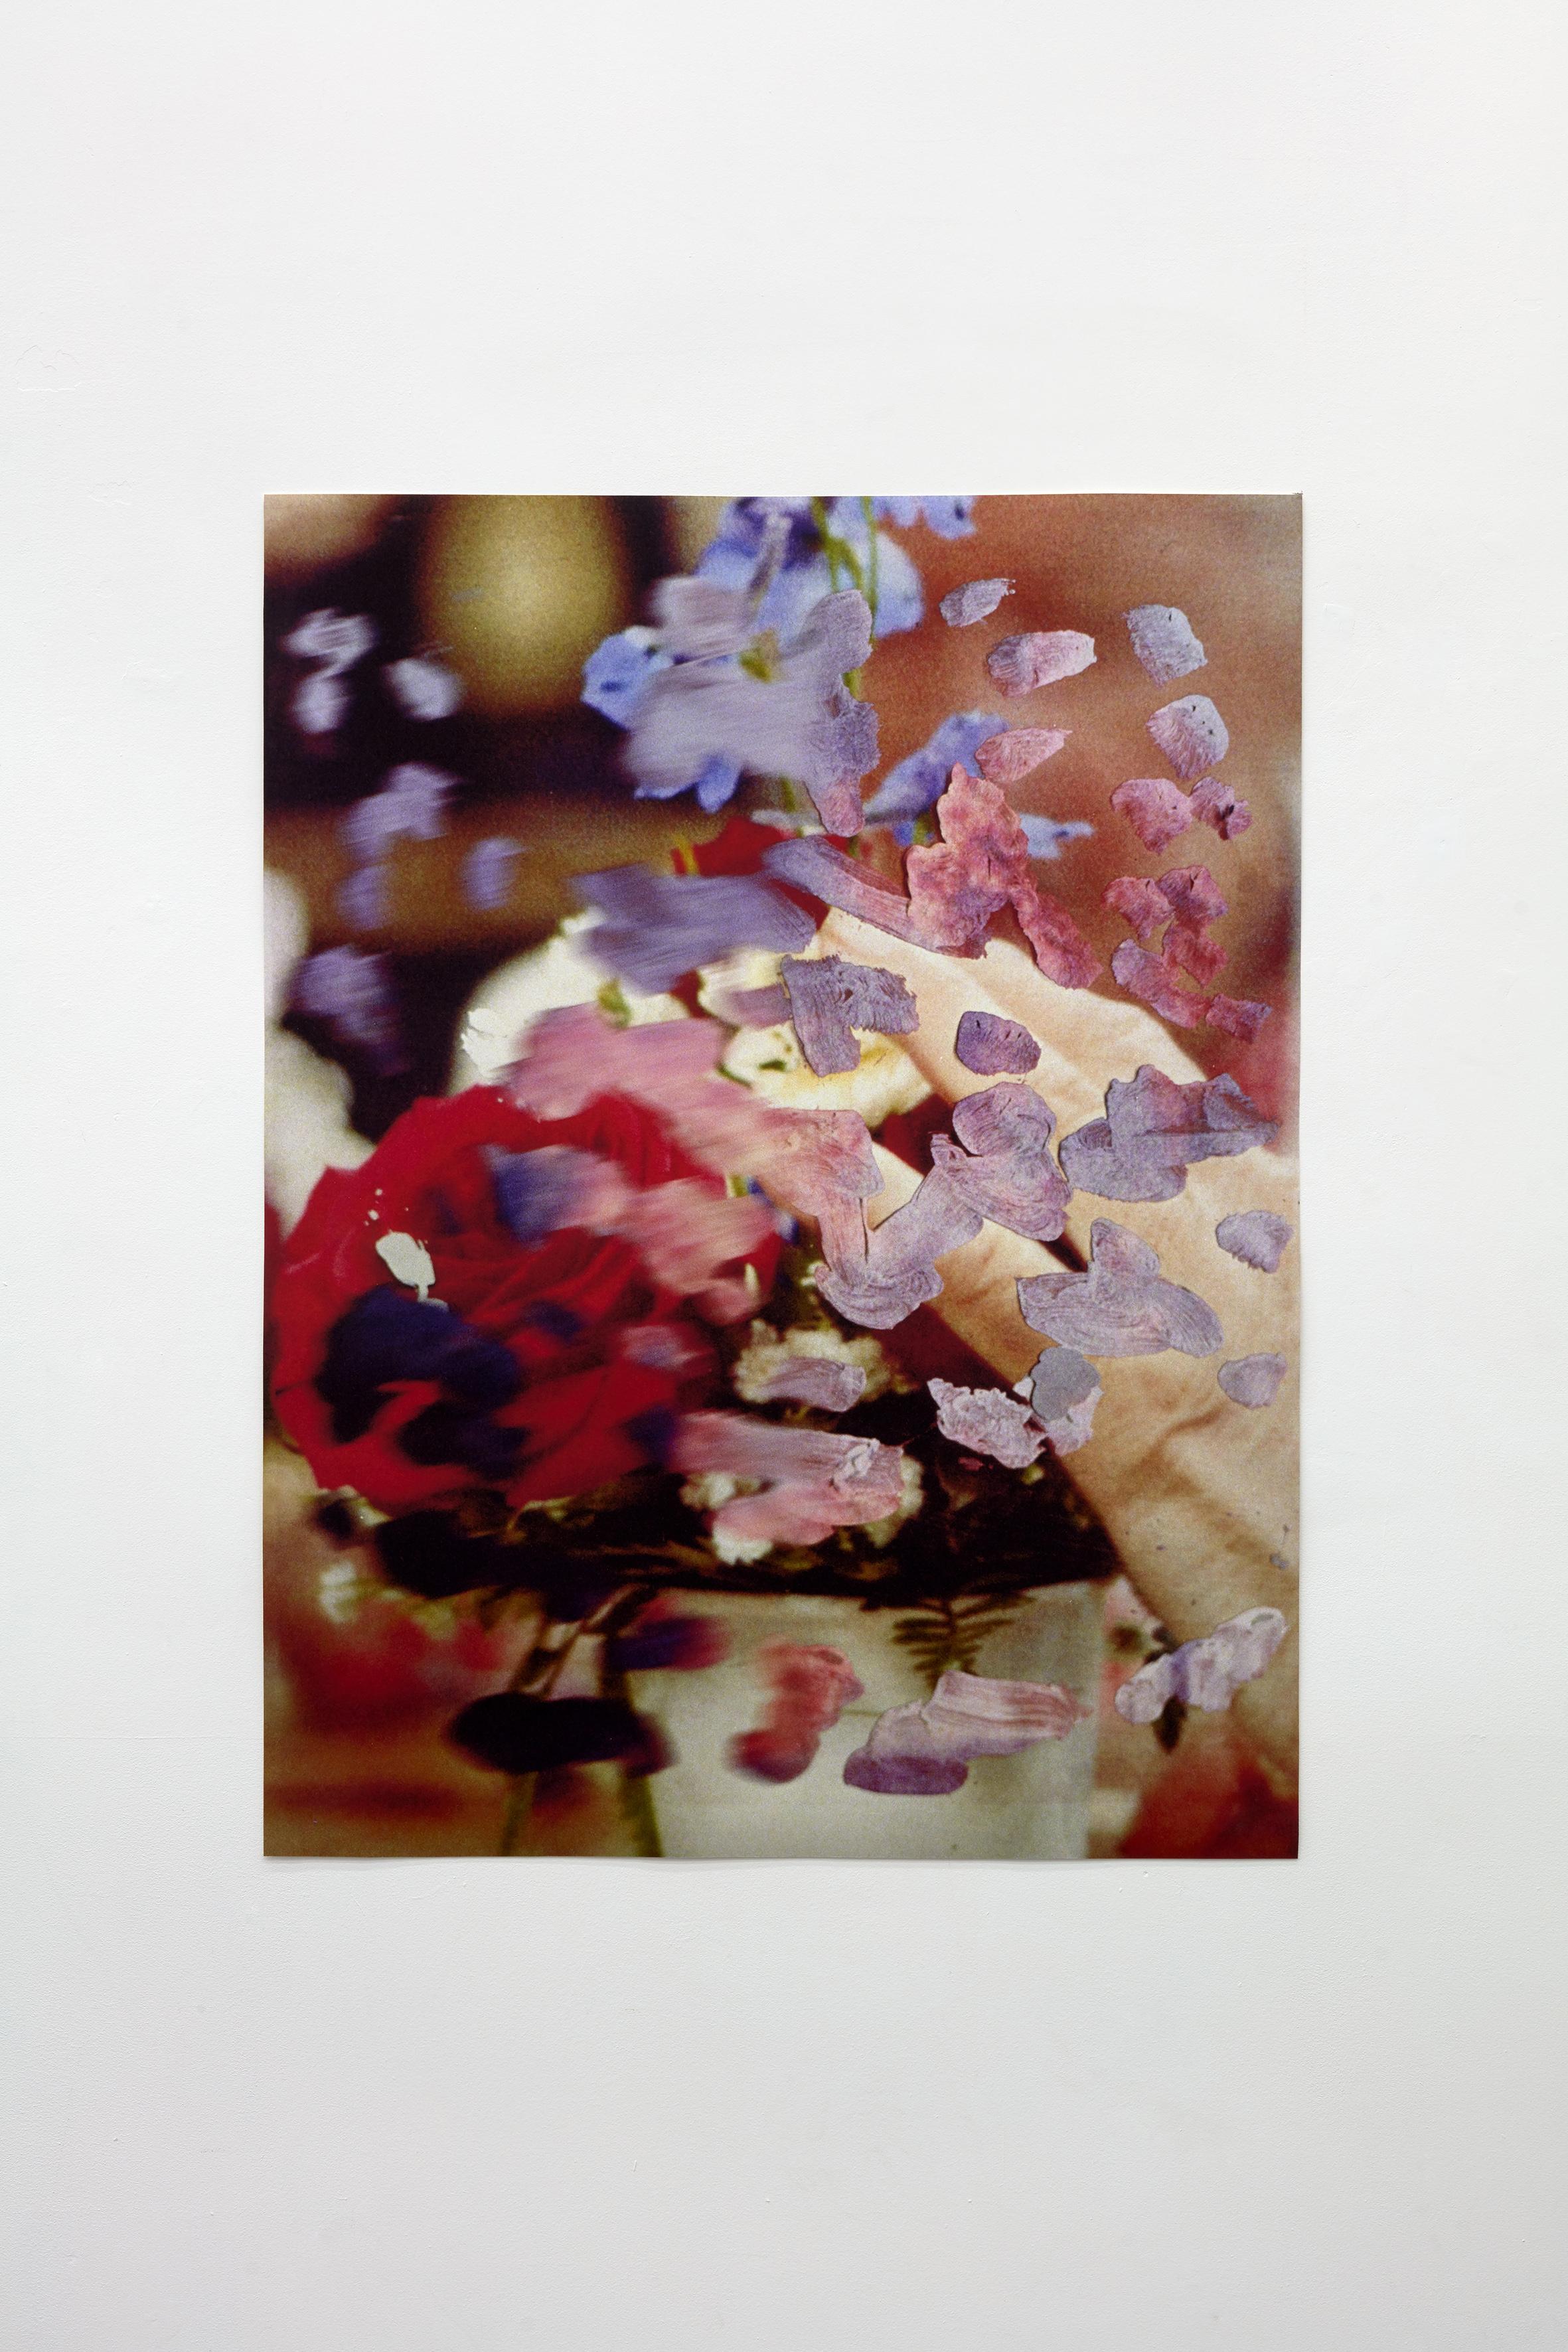 Flower Arrangement  2018  101x134cm  pigment print on german etching paper.